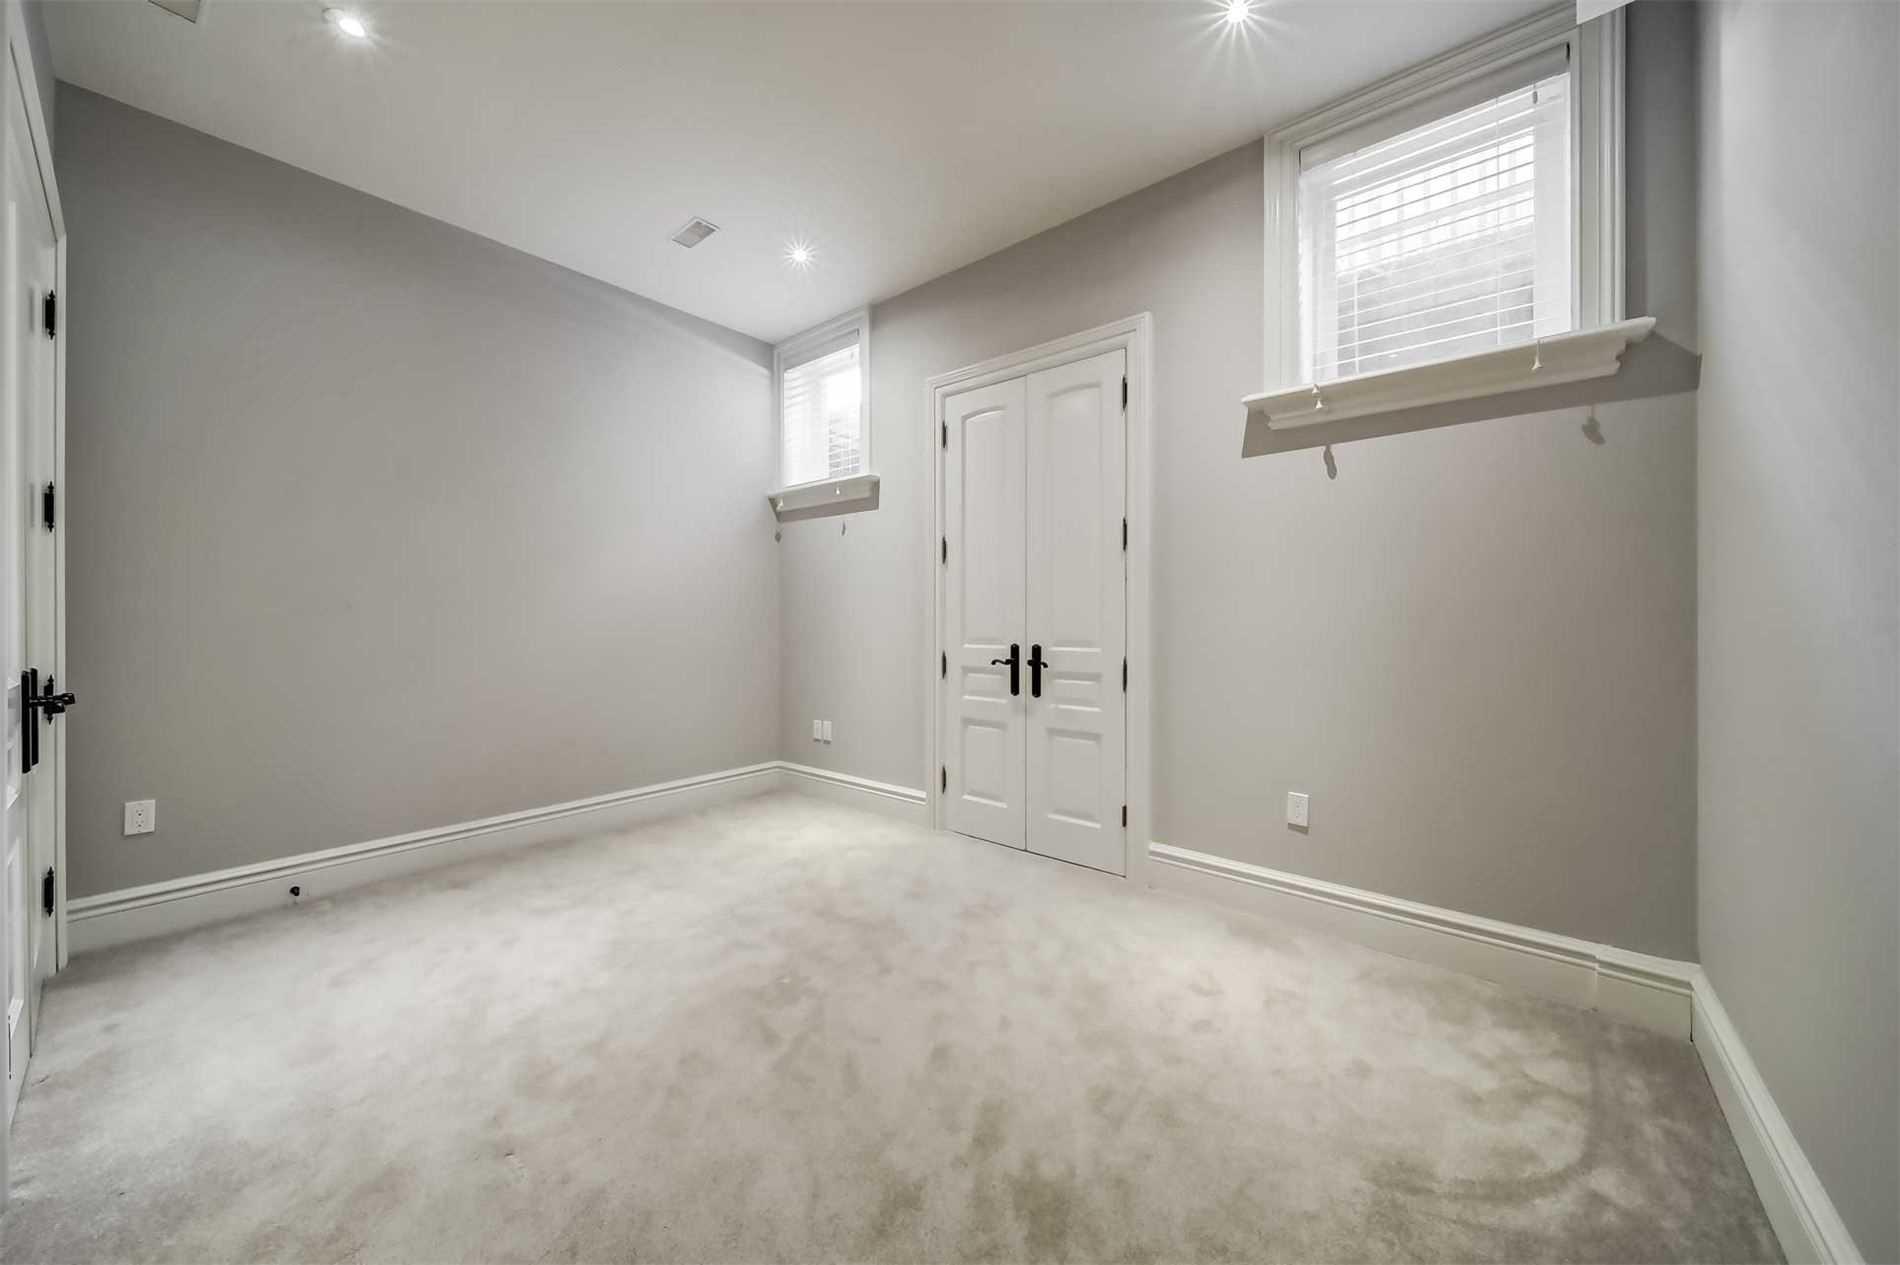 93 Larkfield Dr, Toronto, Ontario M3B2H6, 5 Bedrooms Bedrooms, 11 Rooms Rooms,8 BathroomsBathrooms,Detached,For Sale,Larkfield,C4796731